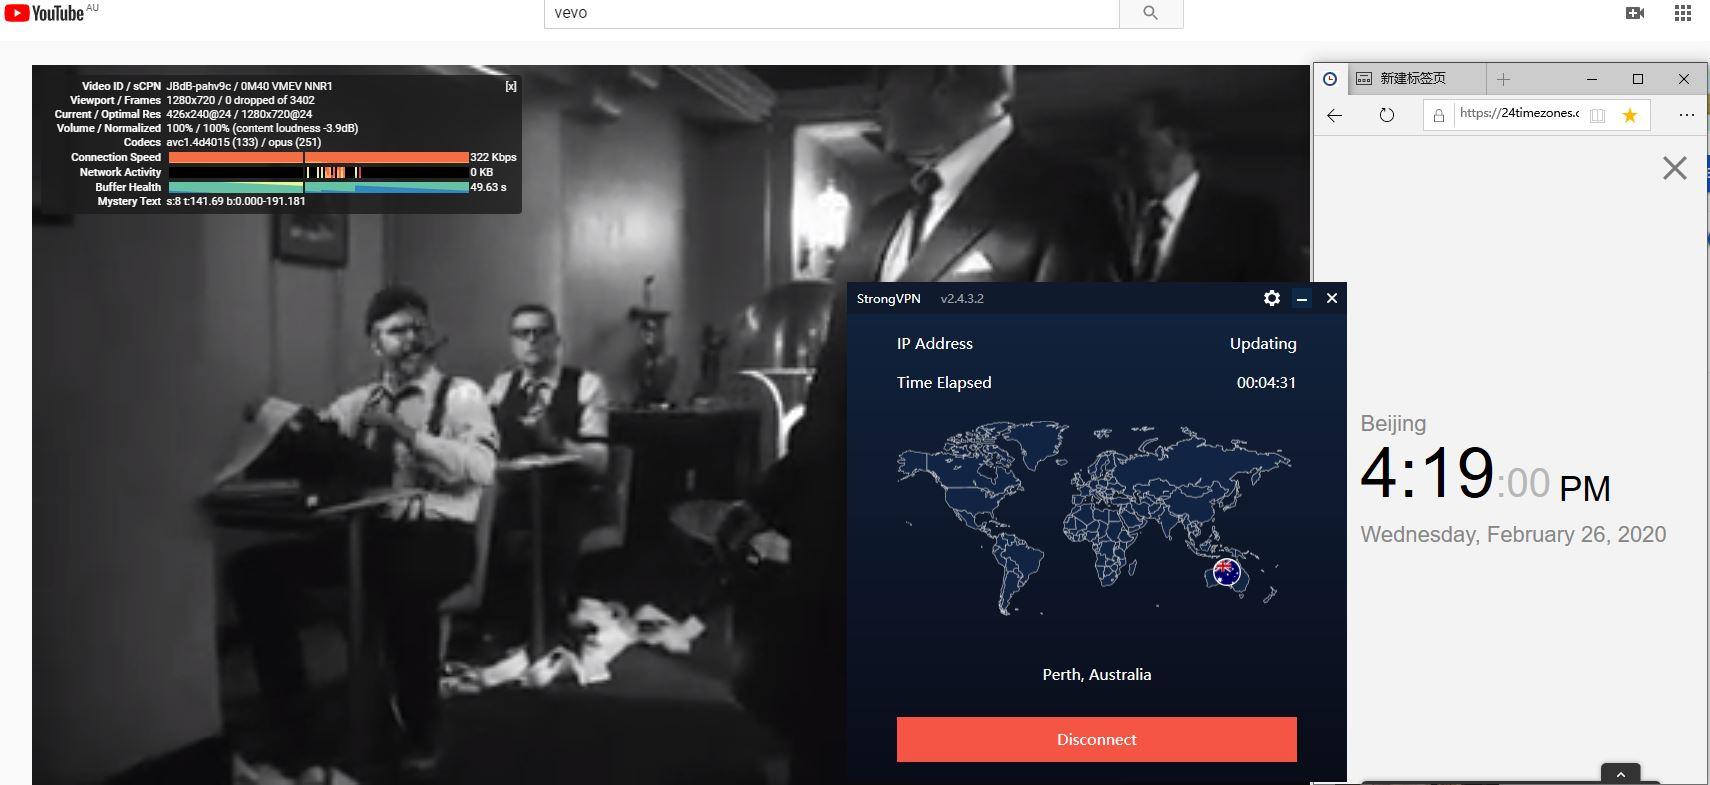 StrongVPN Windows10 Perth Australia 中国VPN翻墙 科学上网 Youtube测速-20200226